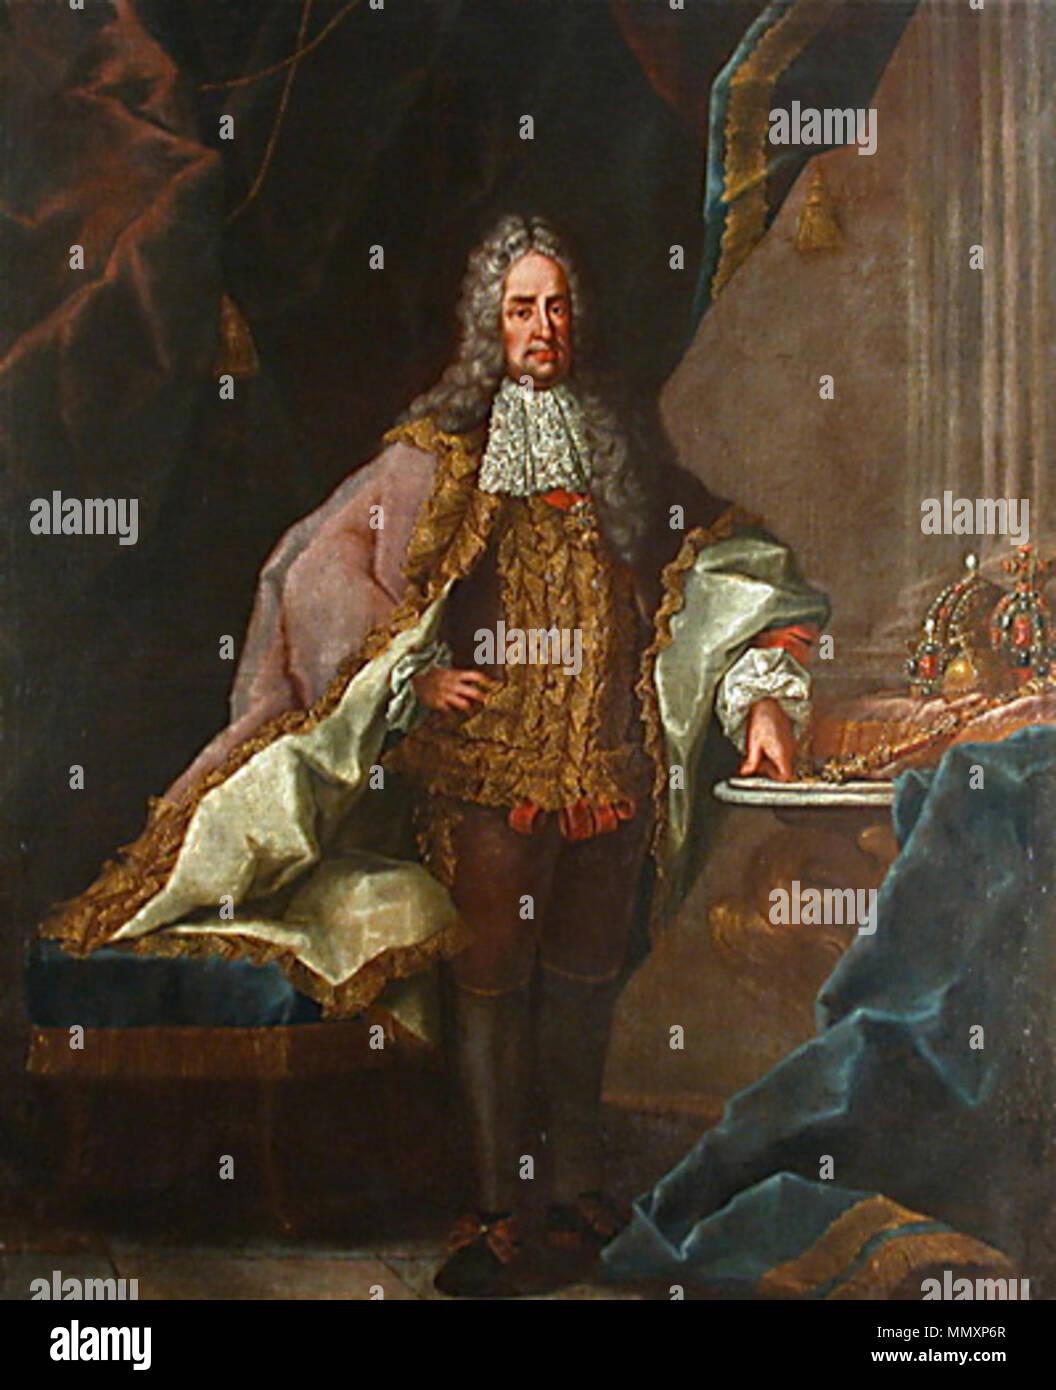 Stephan Francisco I Emperador Del Sacro Imperio Romano Germánico Siglo Xviii Franz I Stephan Fotografía De Stock Alamy